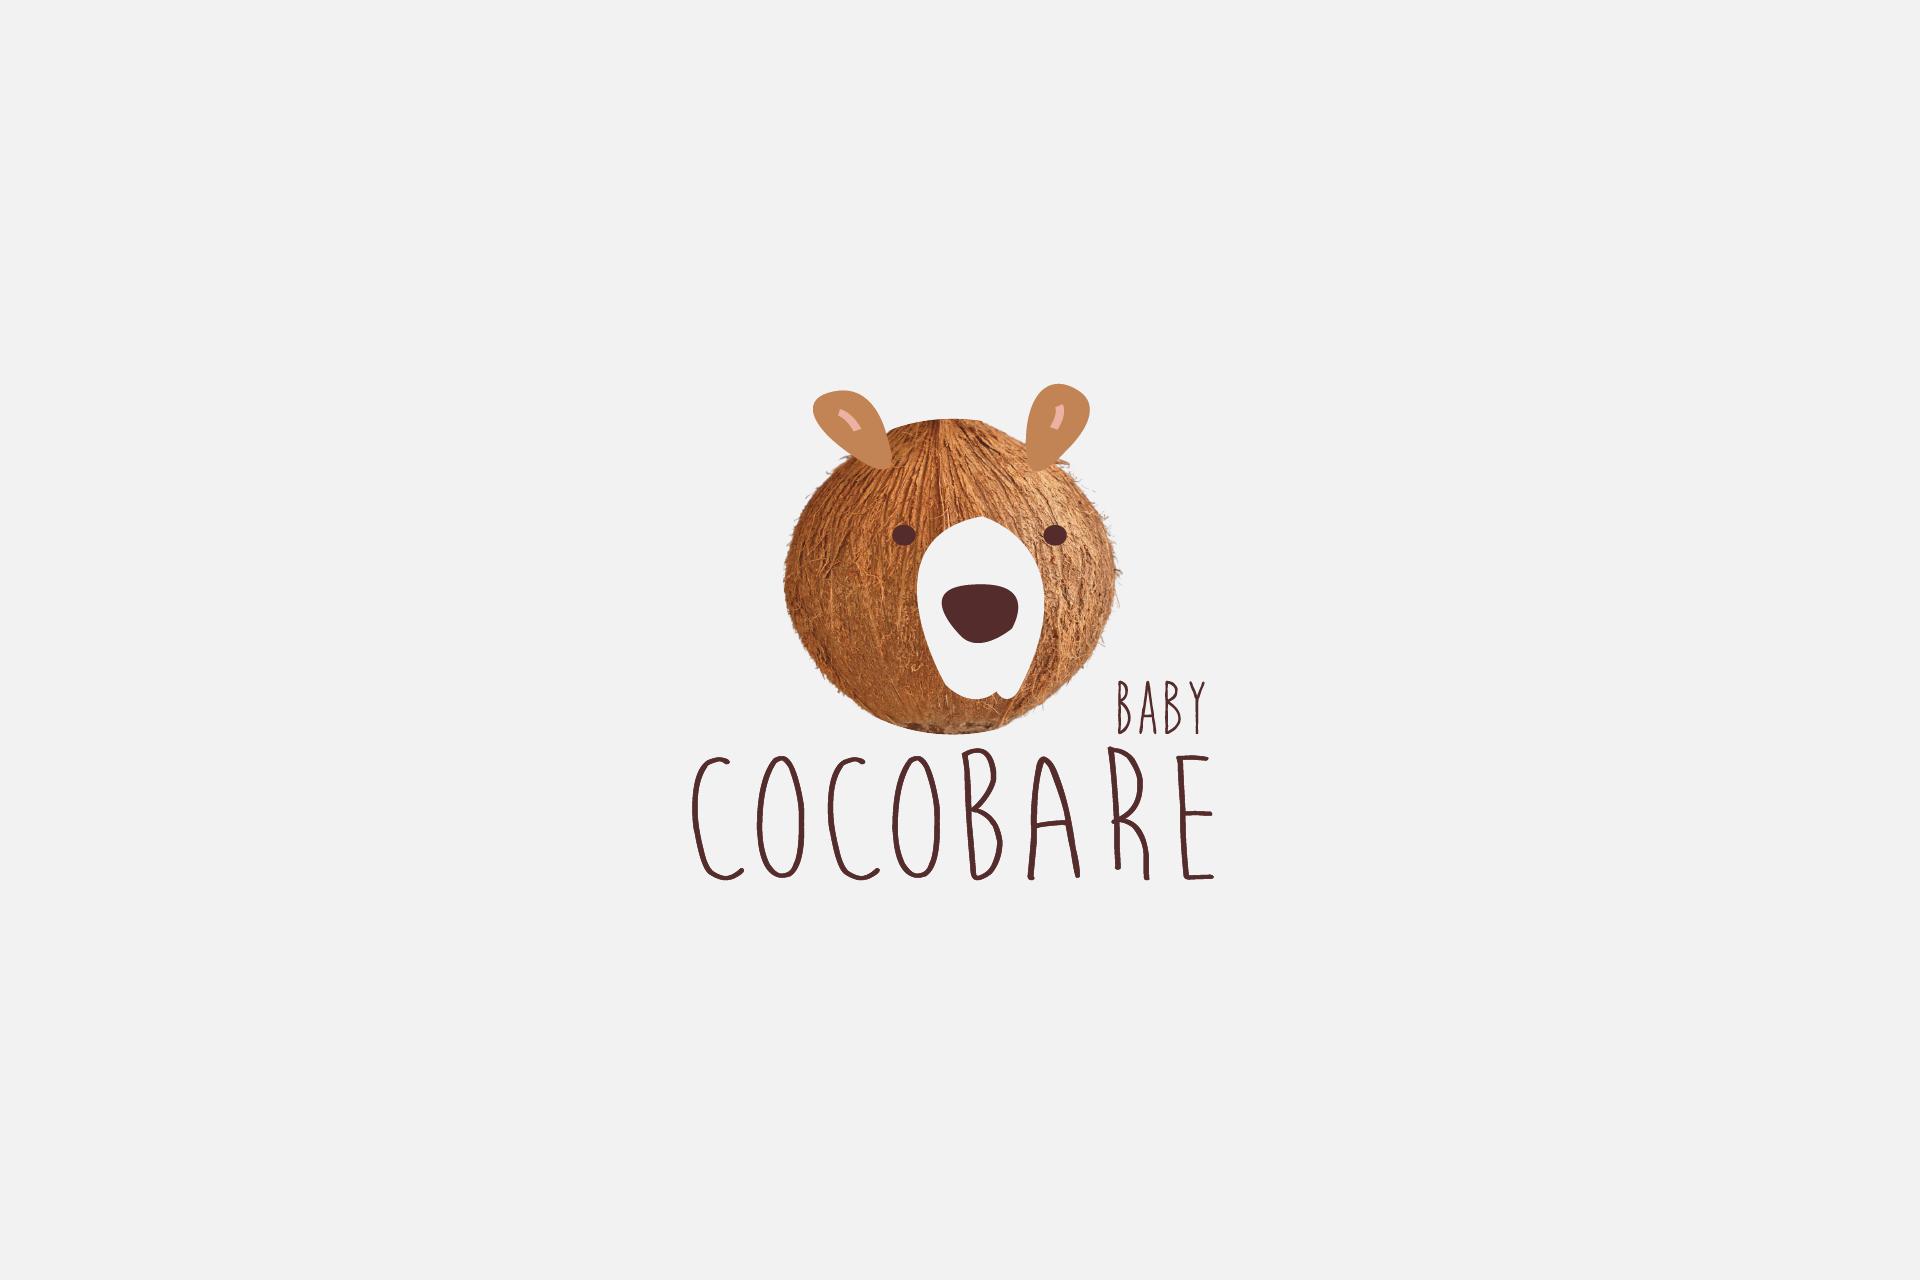 genh-logos-cocobare.png